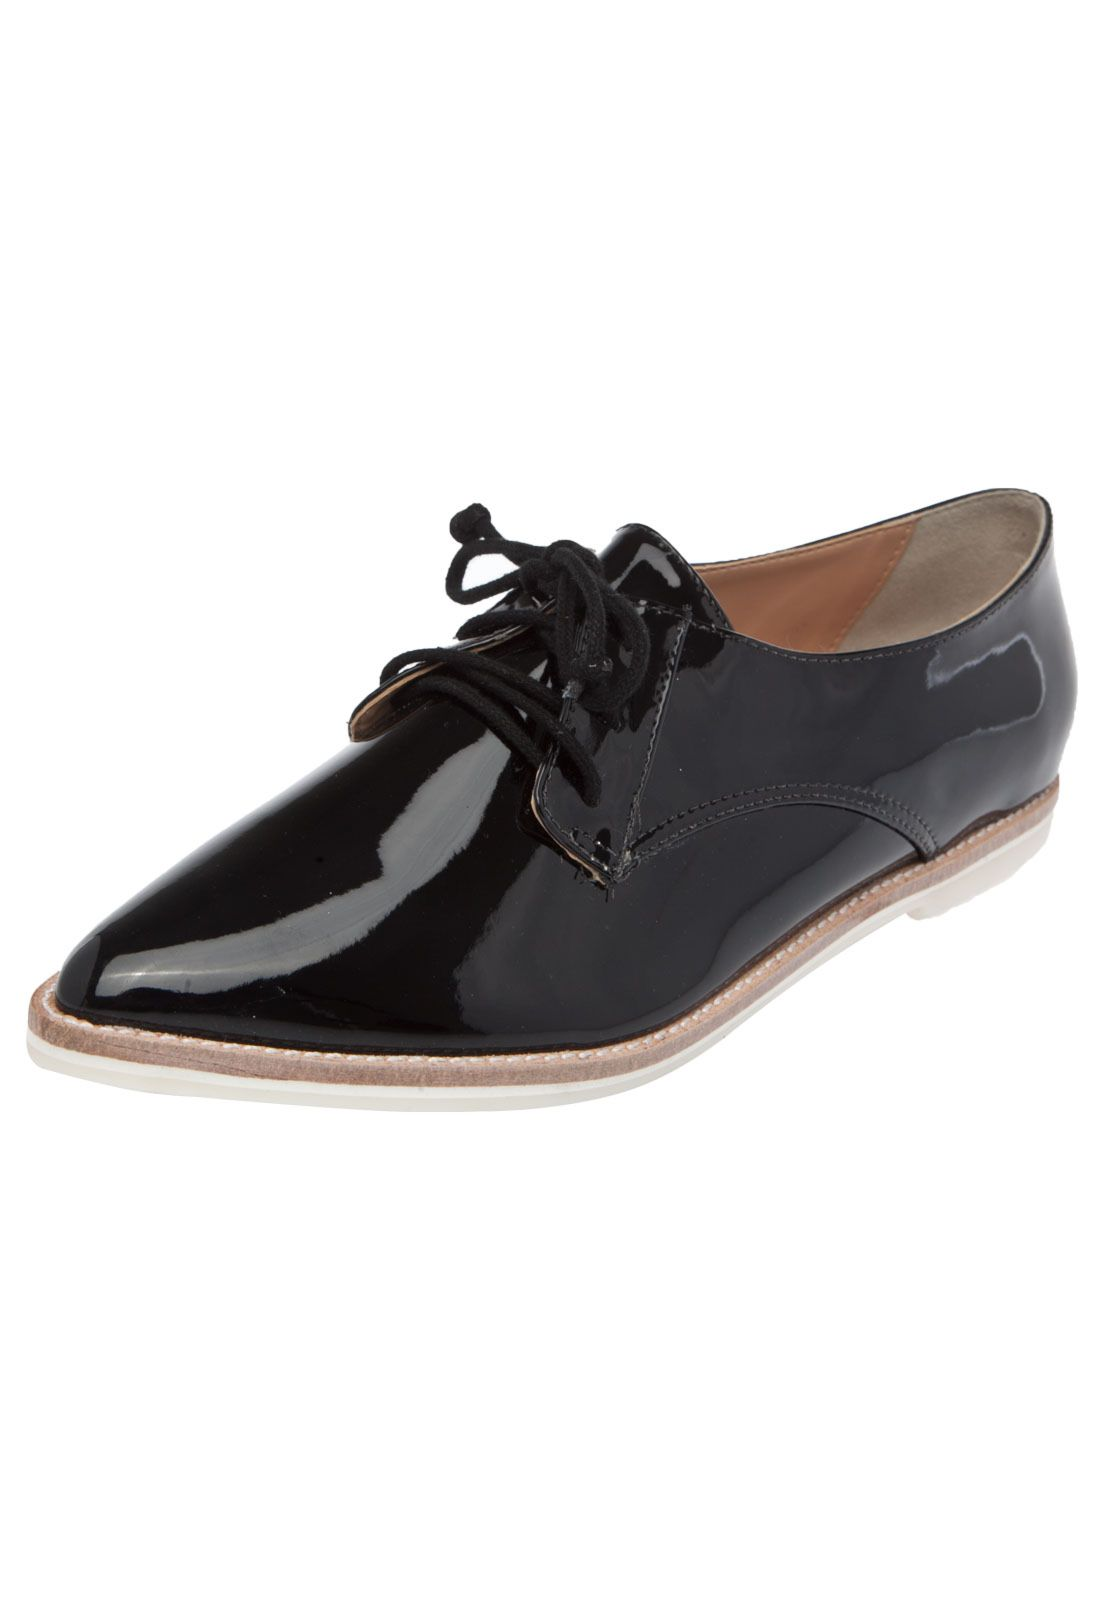 Sapato verniz preto infantil | Sapato verniz, Sapatos, Feminino